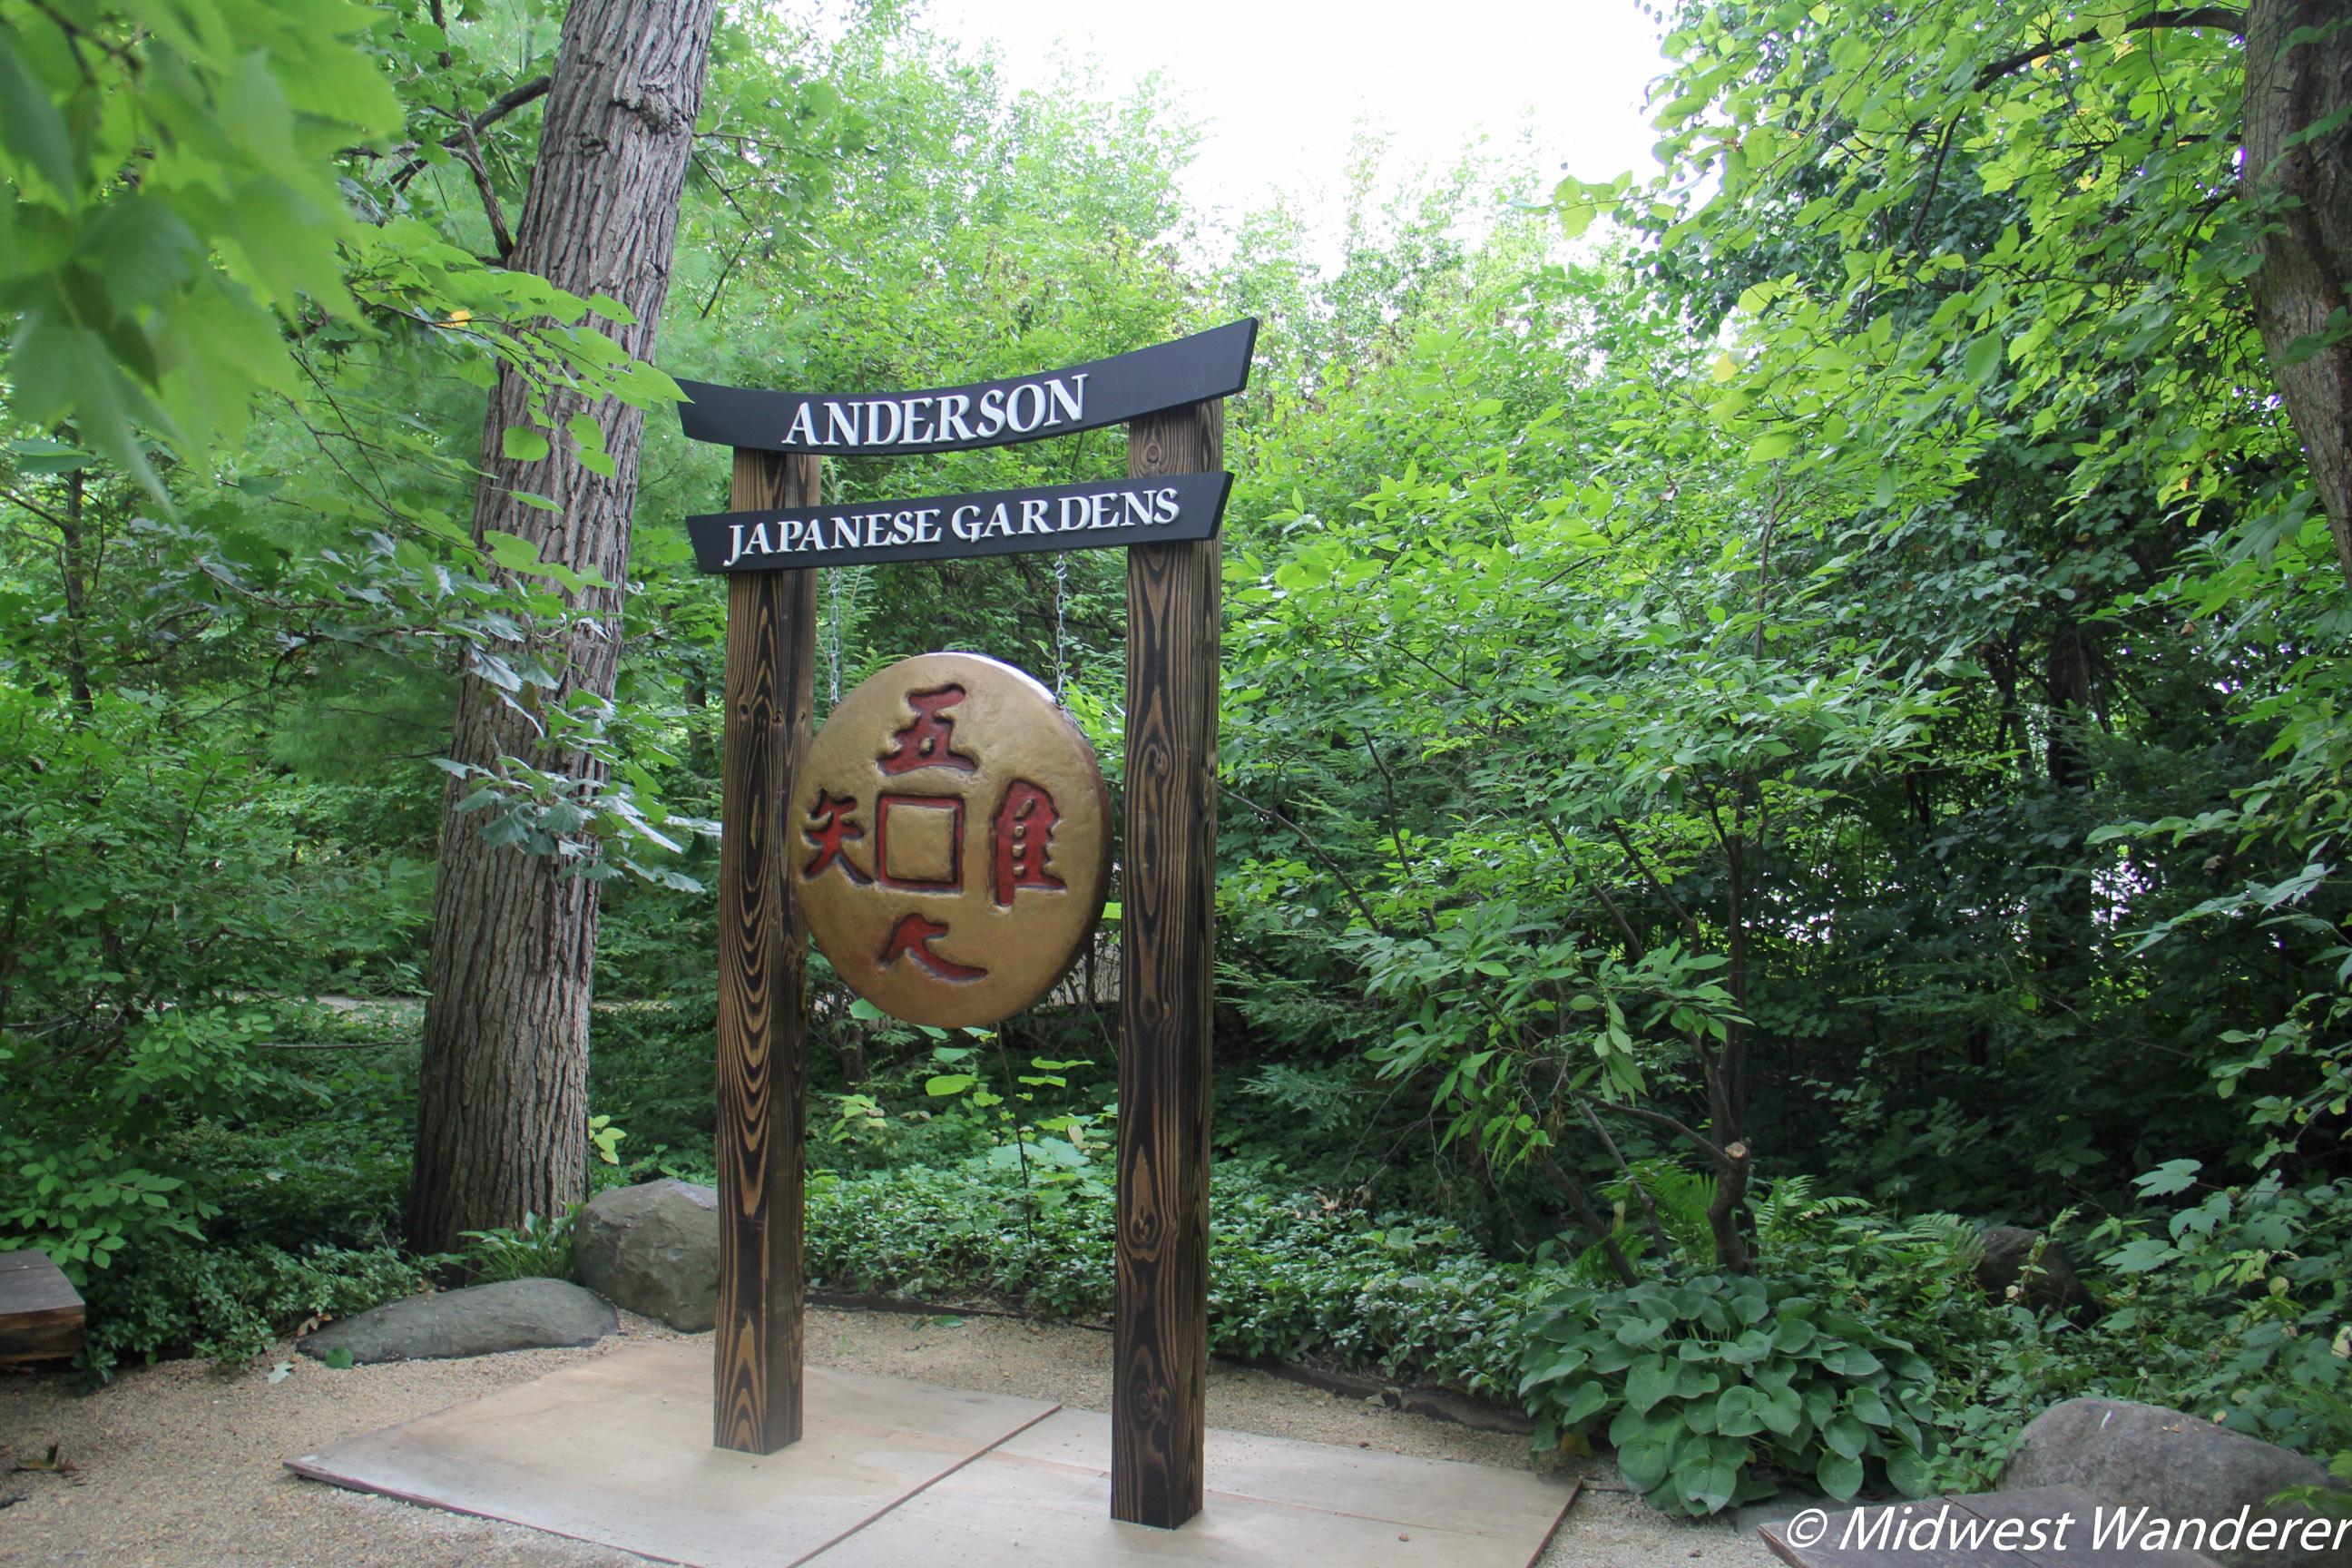 Anderson Japanese Gardens - Entrance